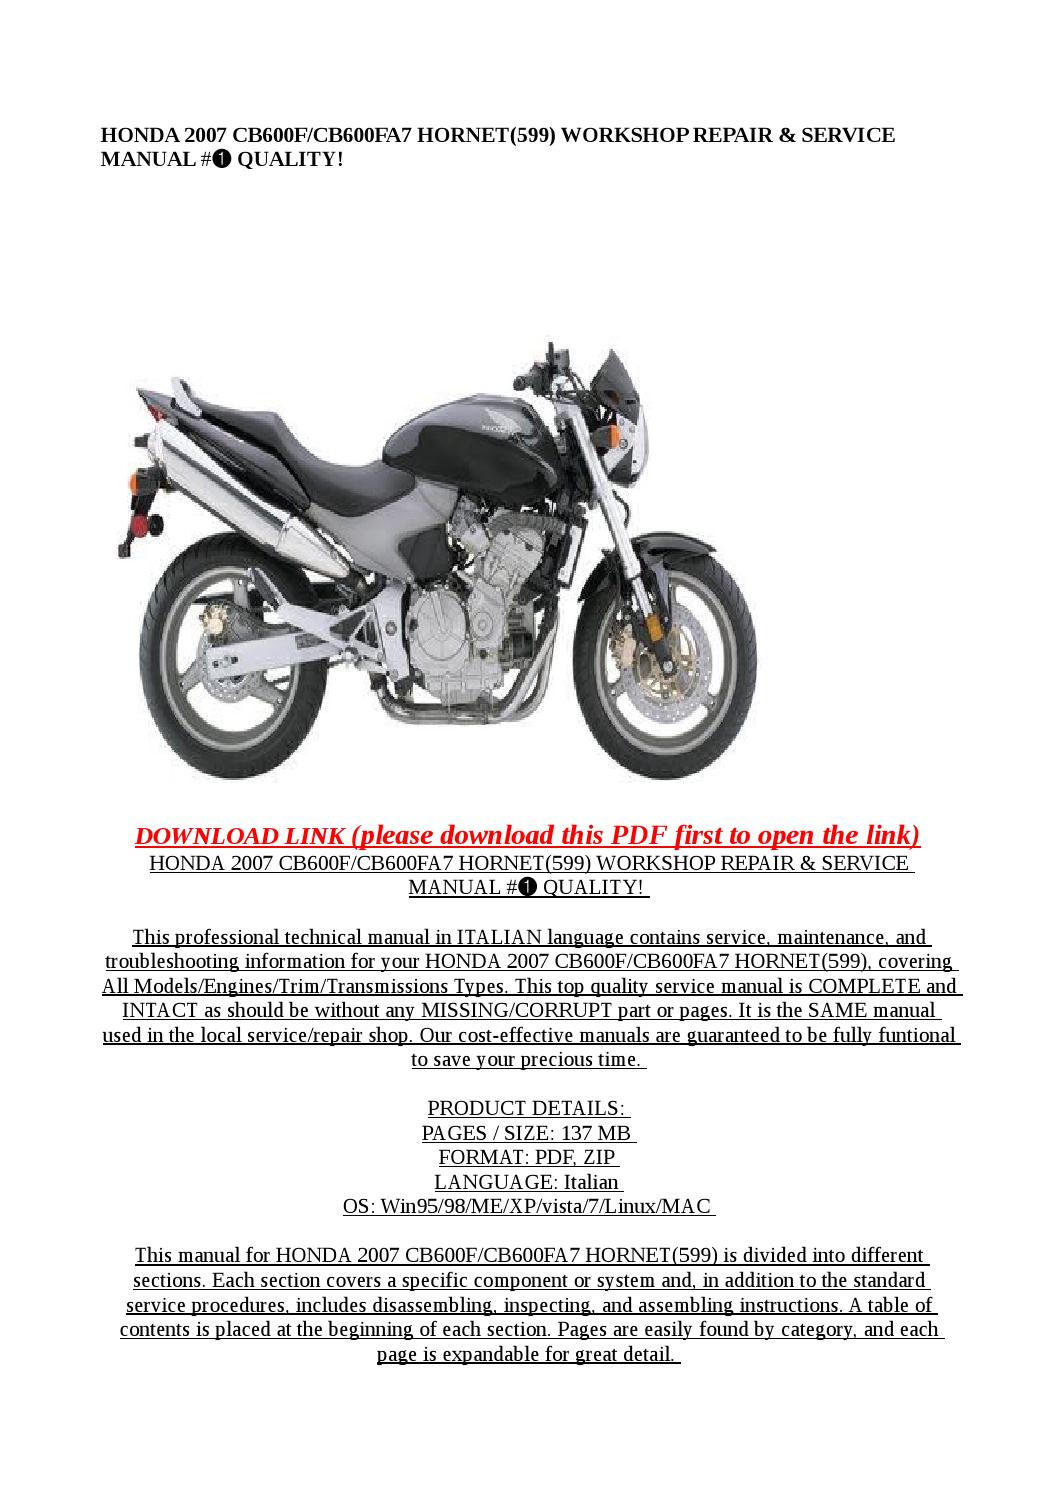 Honda 2007 cb600 cb600fa7 hornet(599) workshop repair & service manual #➀  quality! by Dora tang - issuu